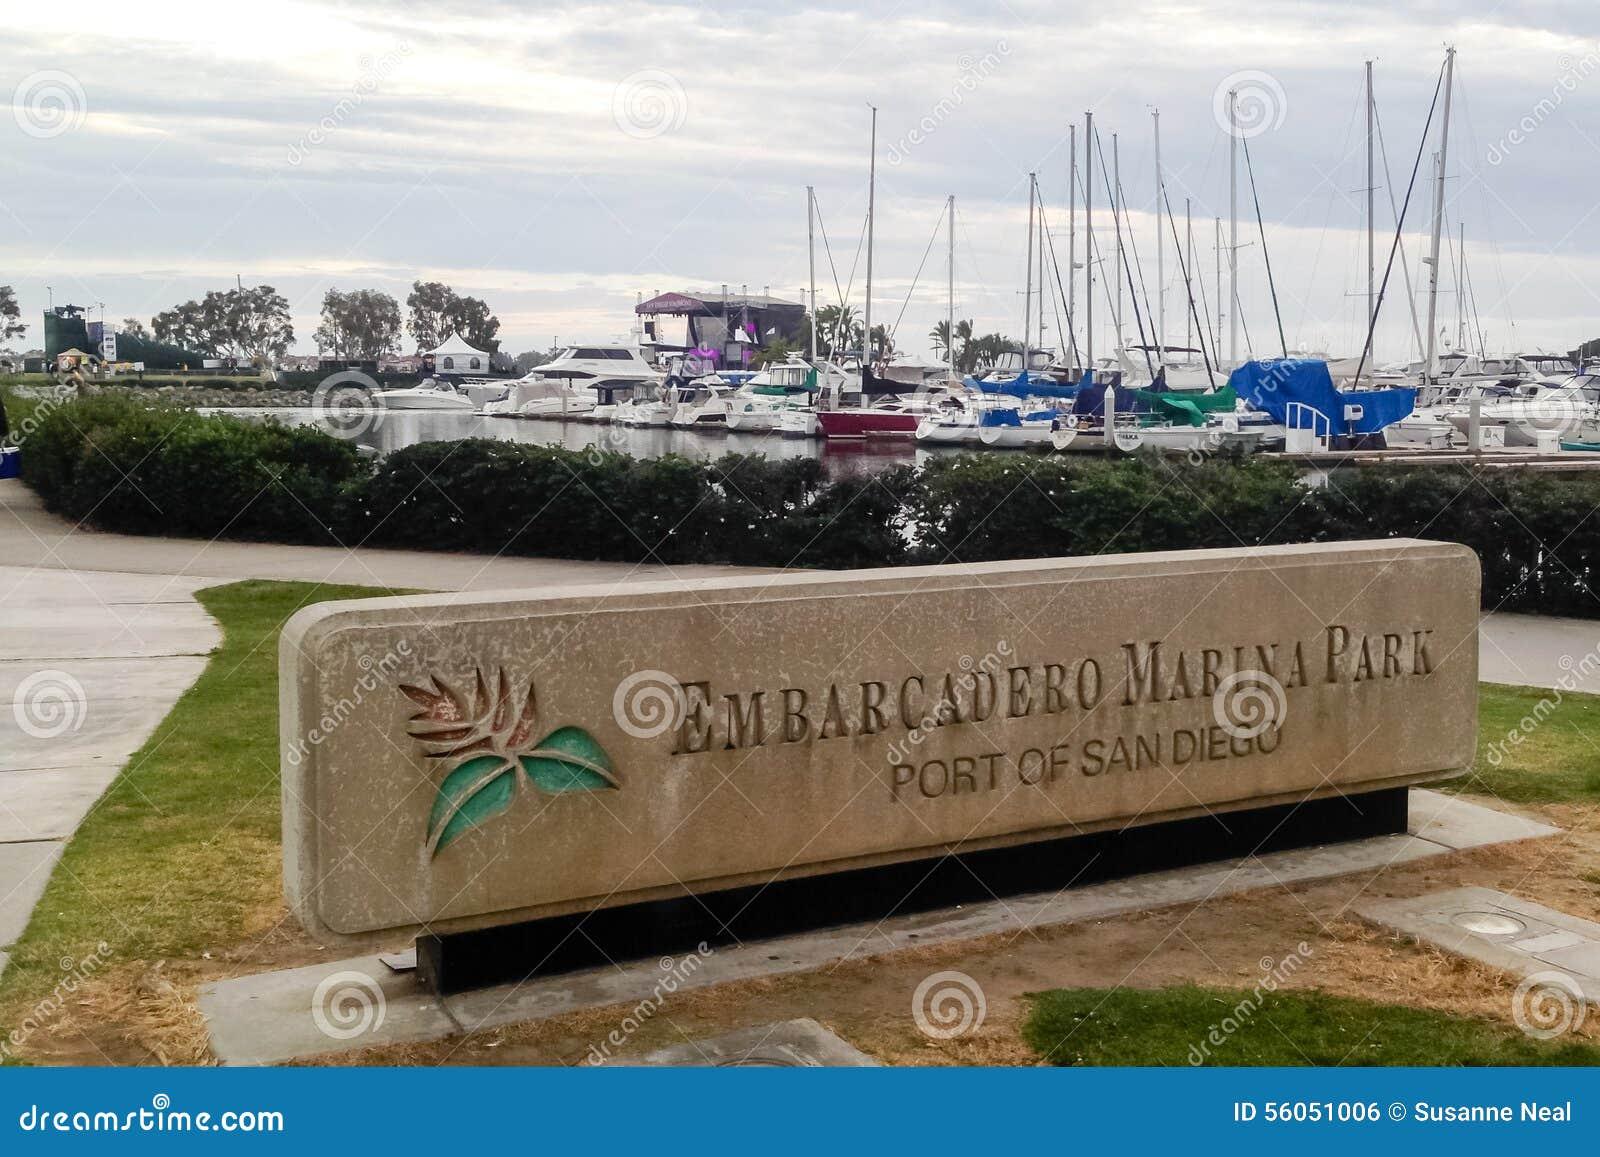 Port Of San Diego California Stock Photo Cartoondealer